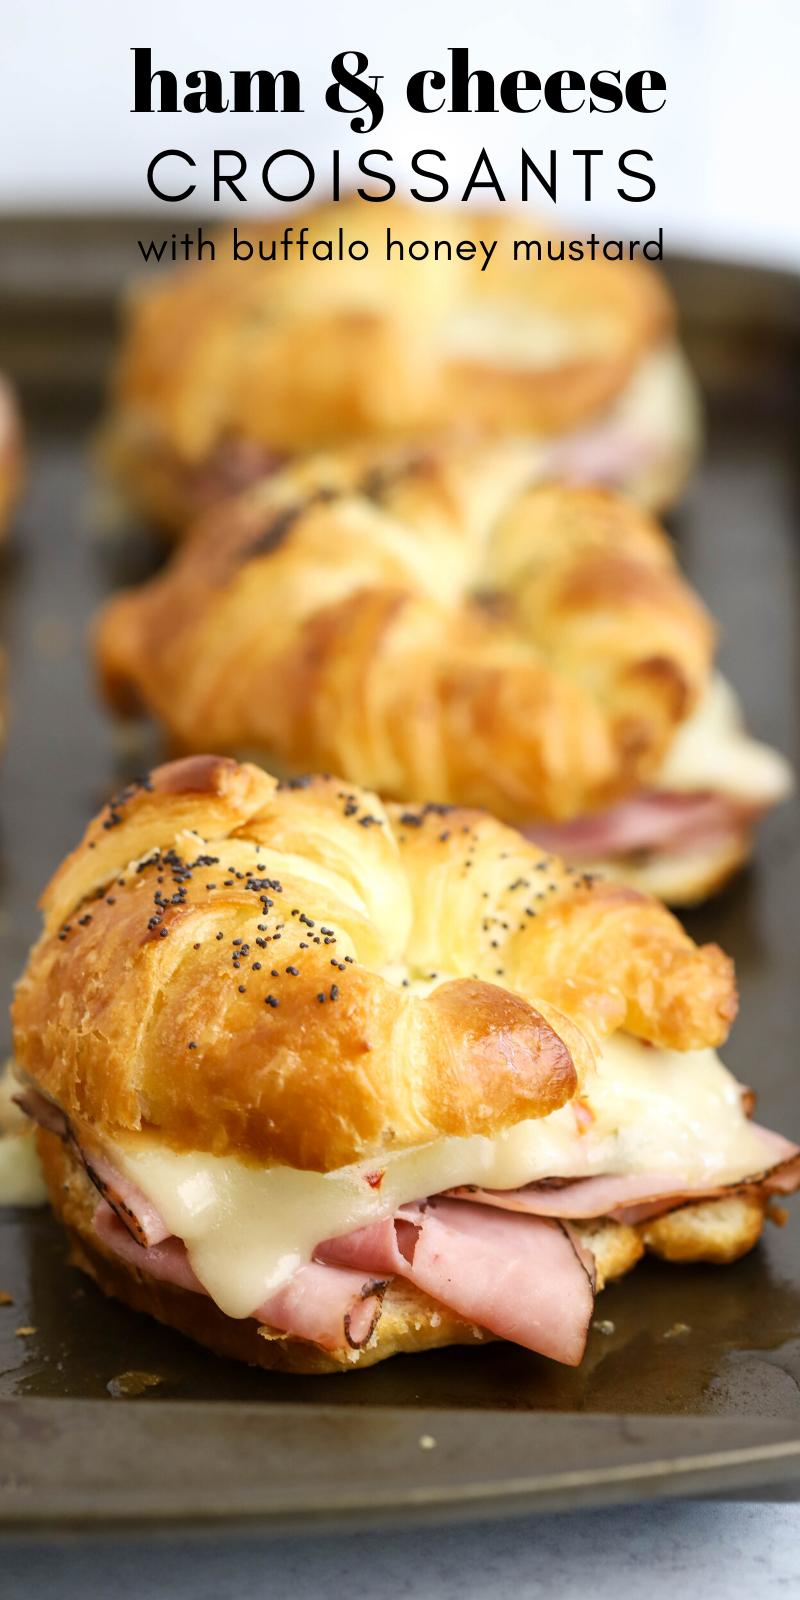 Spicy Buffalo Honey Mustard Ham and Cheese Croissant | Simply Made Recipes